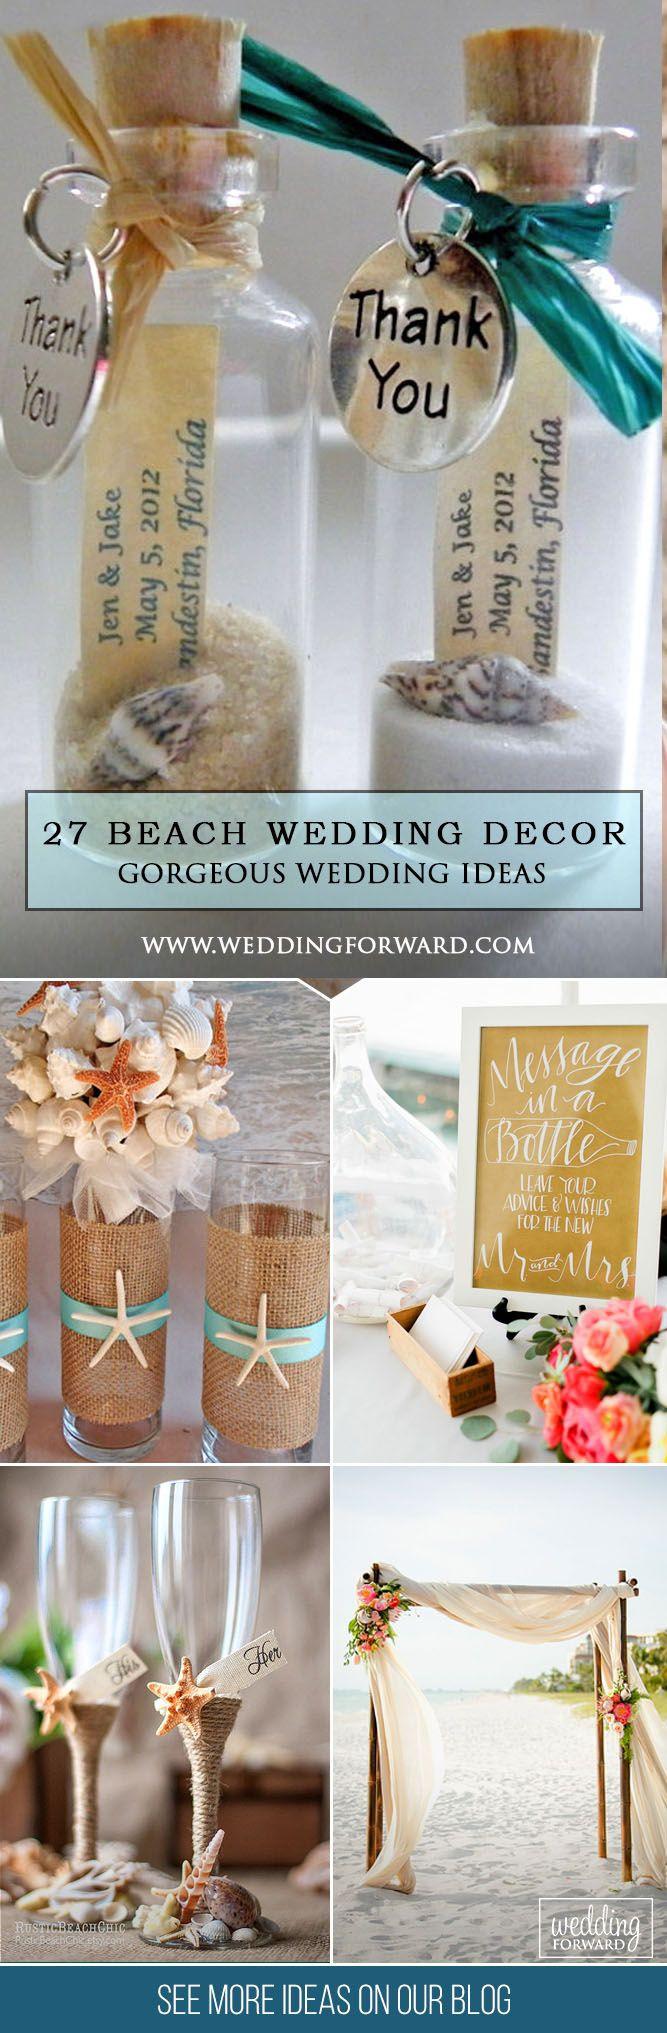 Best ideas about DIY Beach Wedding Ideas . Save or Pin 17 Best ideas about Beach Theme Centerpieces on Pinterest Now.